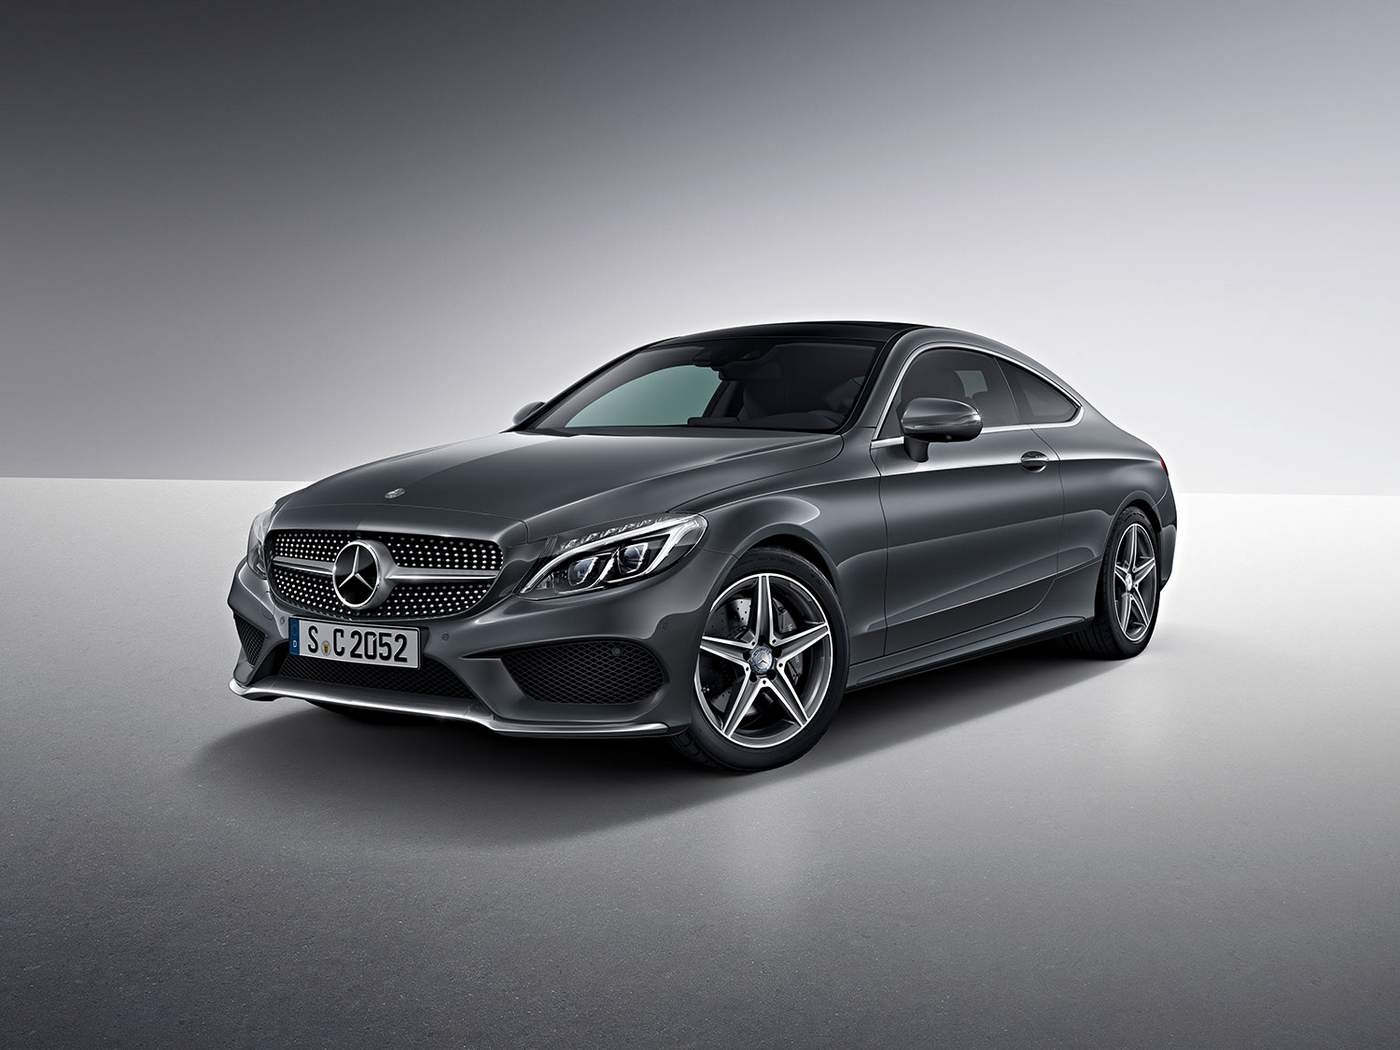 Mercedes Classe C 250 : mercedes classe c 250 sport chega por r 245 9 mil brasil car blog br ~ Medecine-chirurgie-esthetiques.com Avis de Voitures